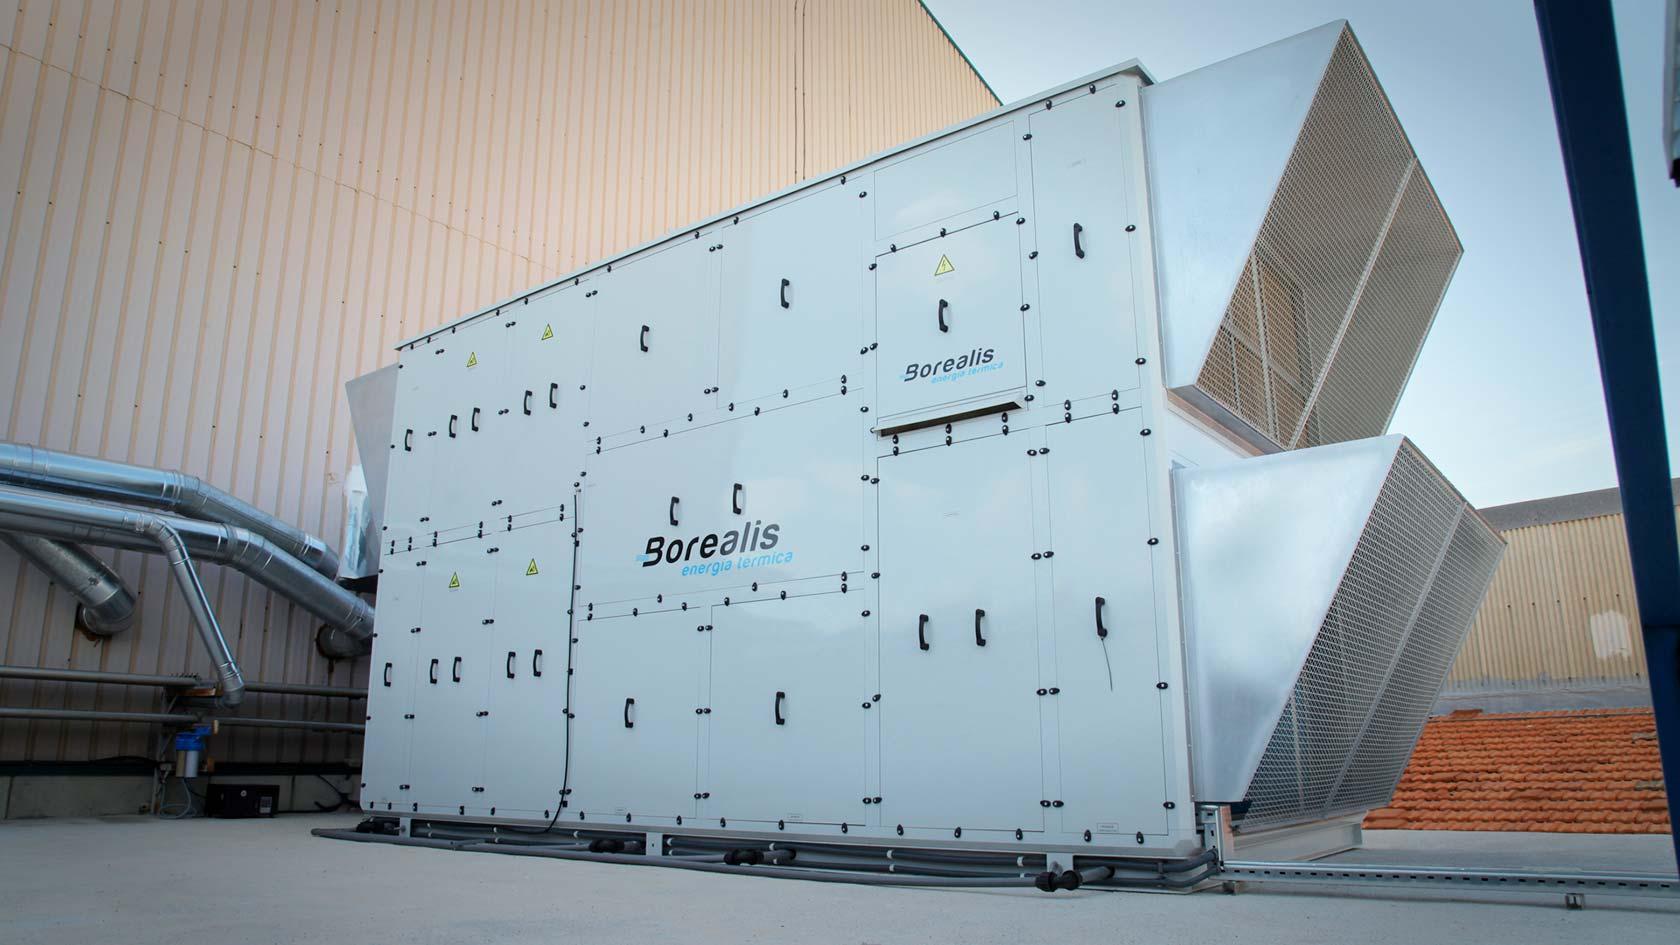 Equipo-deshumidificador-mixto-frigorífico+rotor-secante